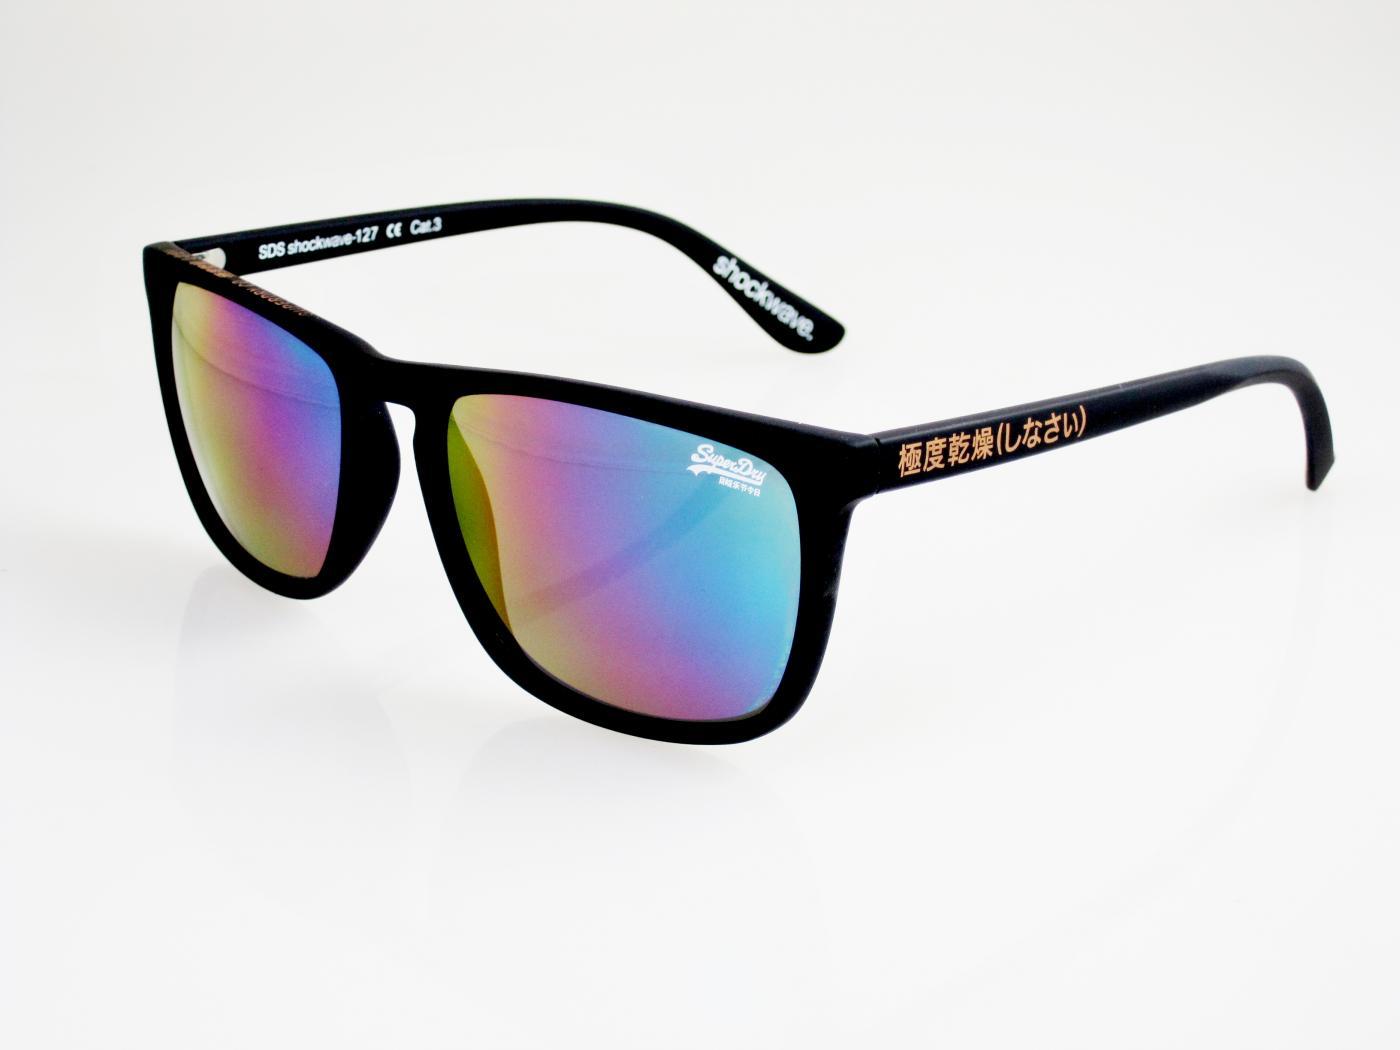 49868e34f Unisex slnečné okuliare Superdry | oftalens.sk